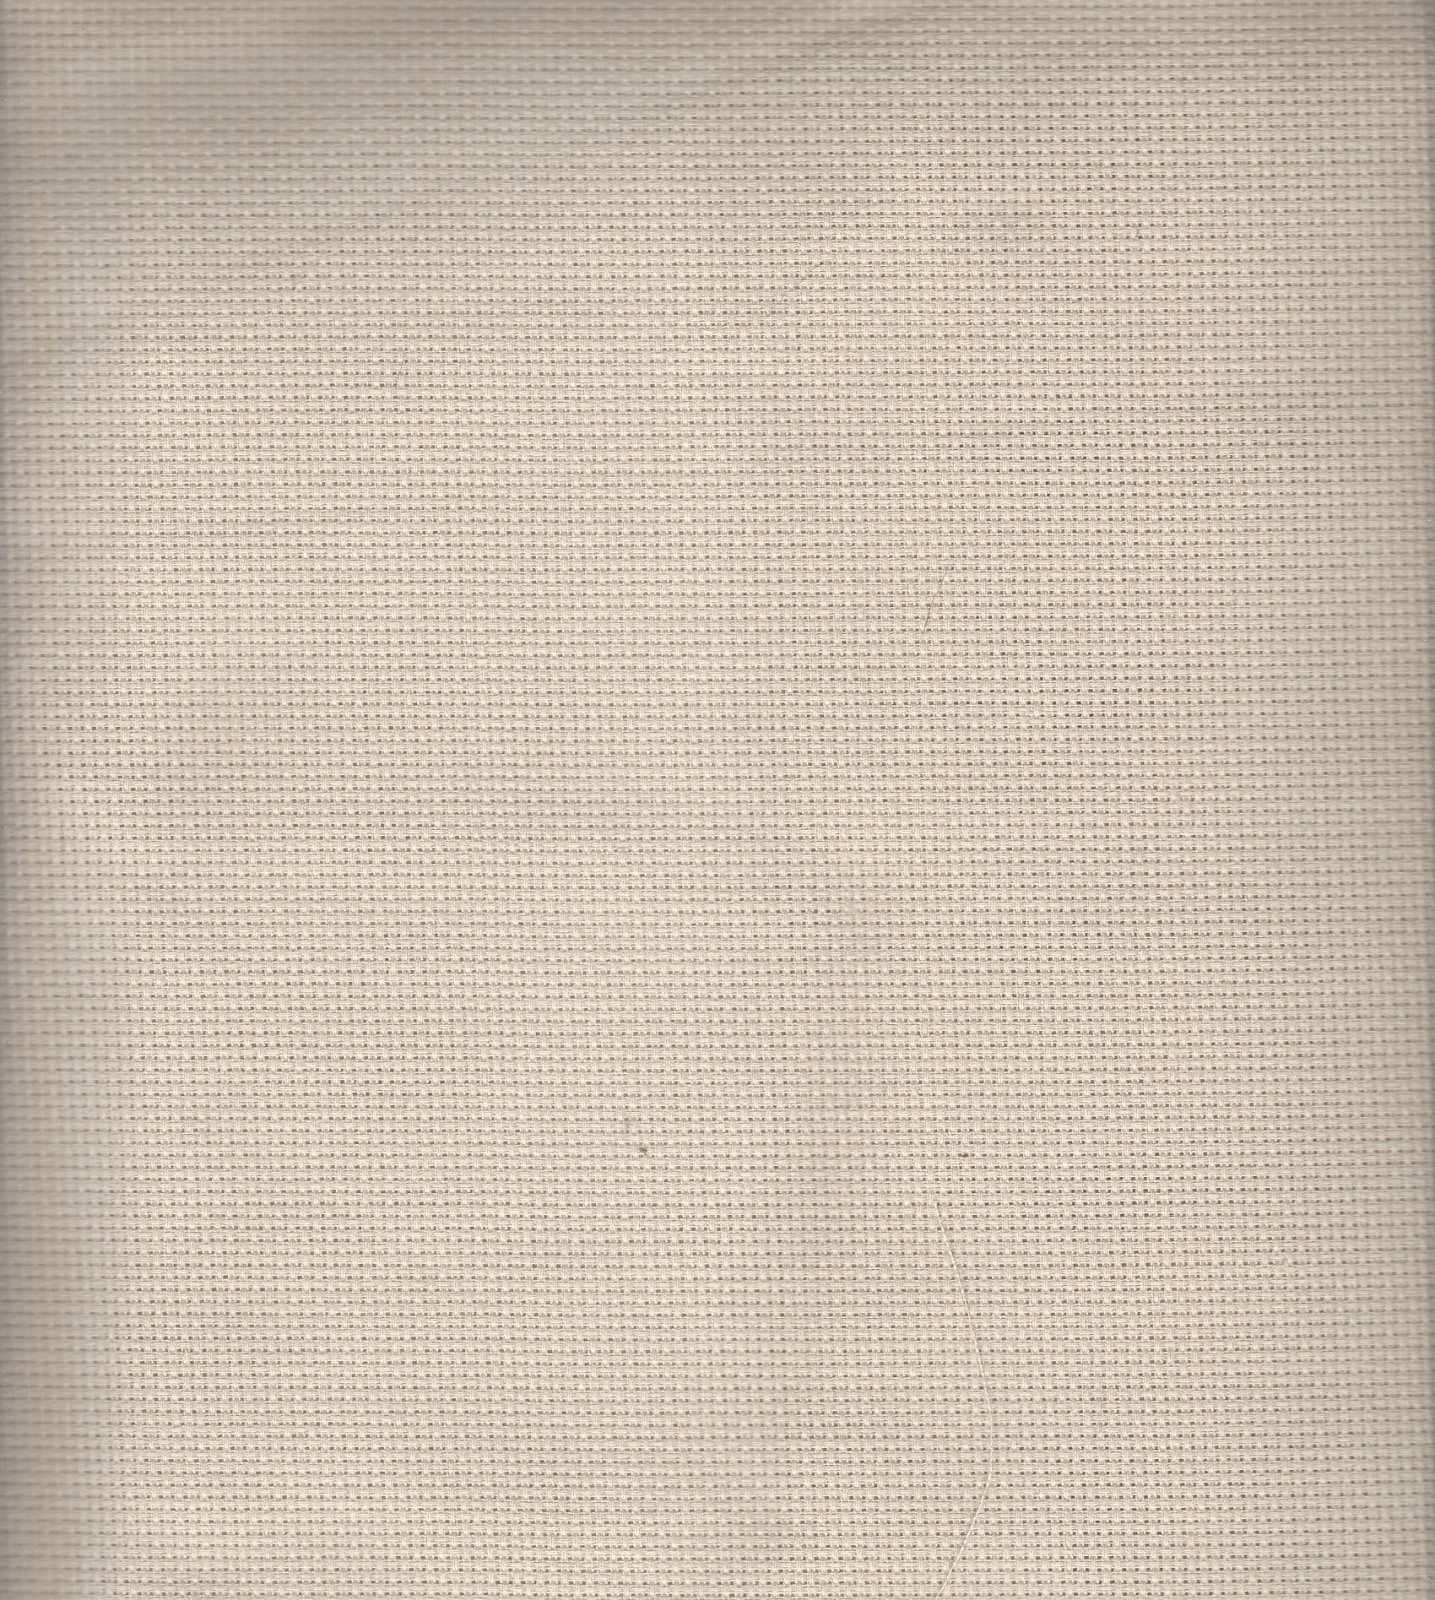 Aida 14ct Bone/Bisque (discontinued color)